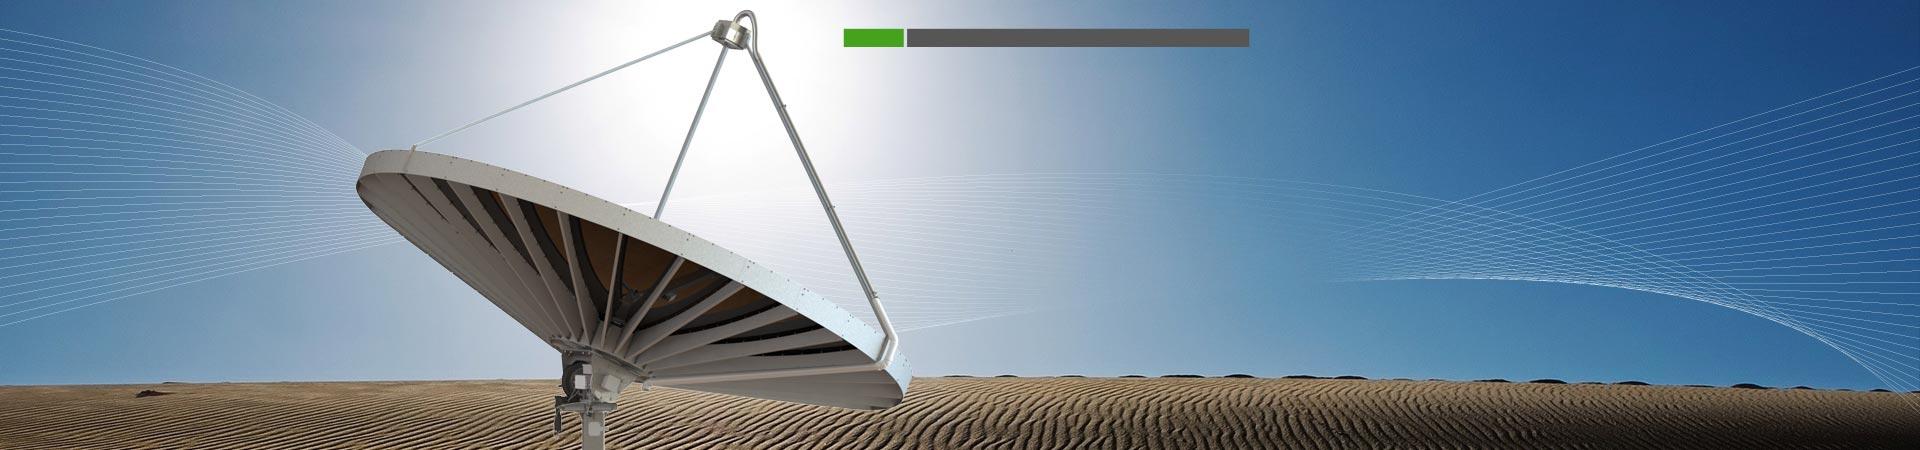 solar dish concentrating solar power